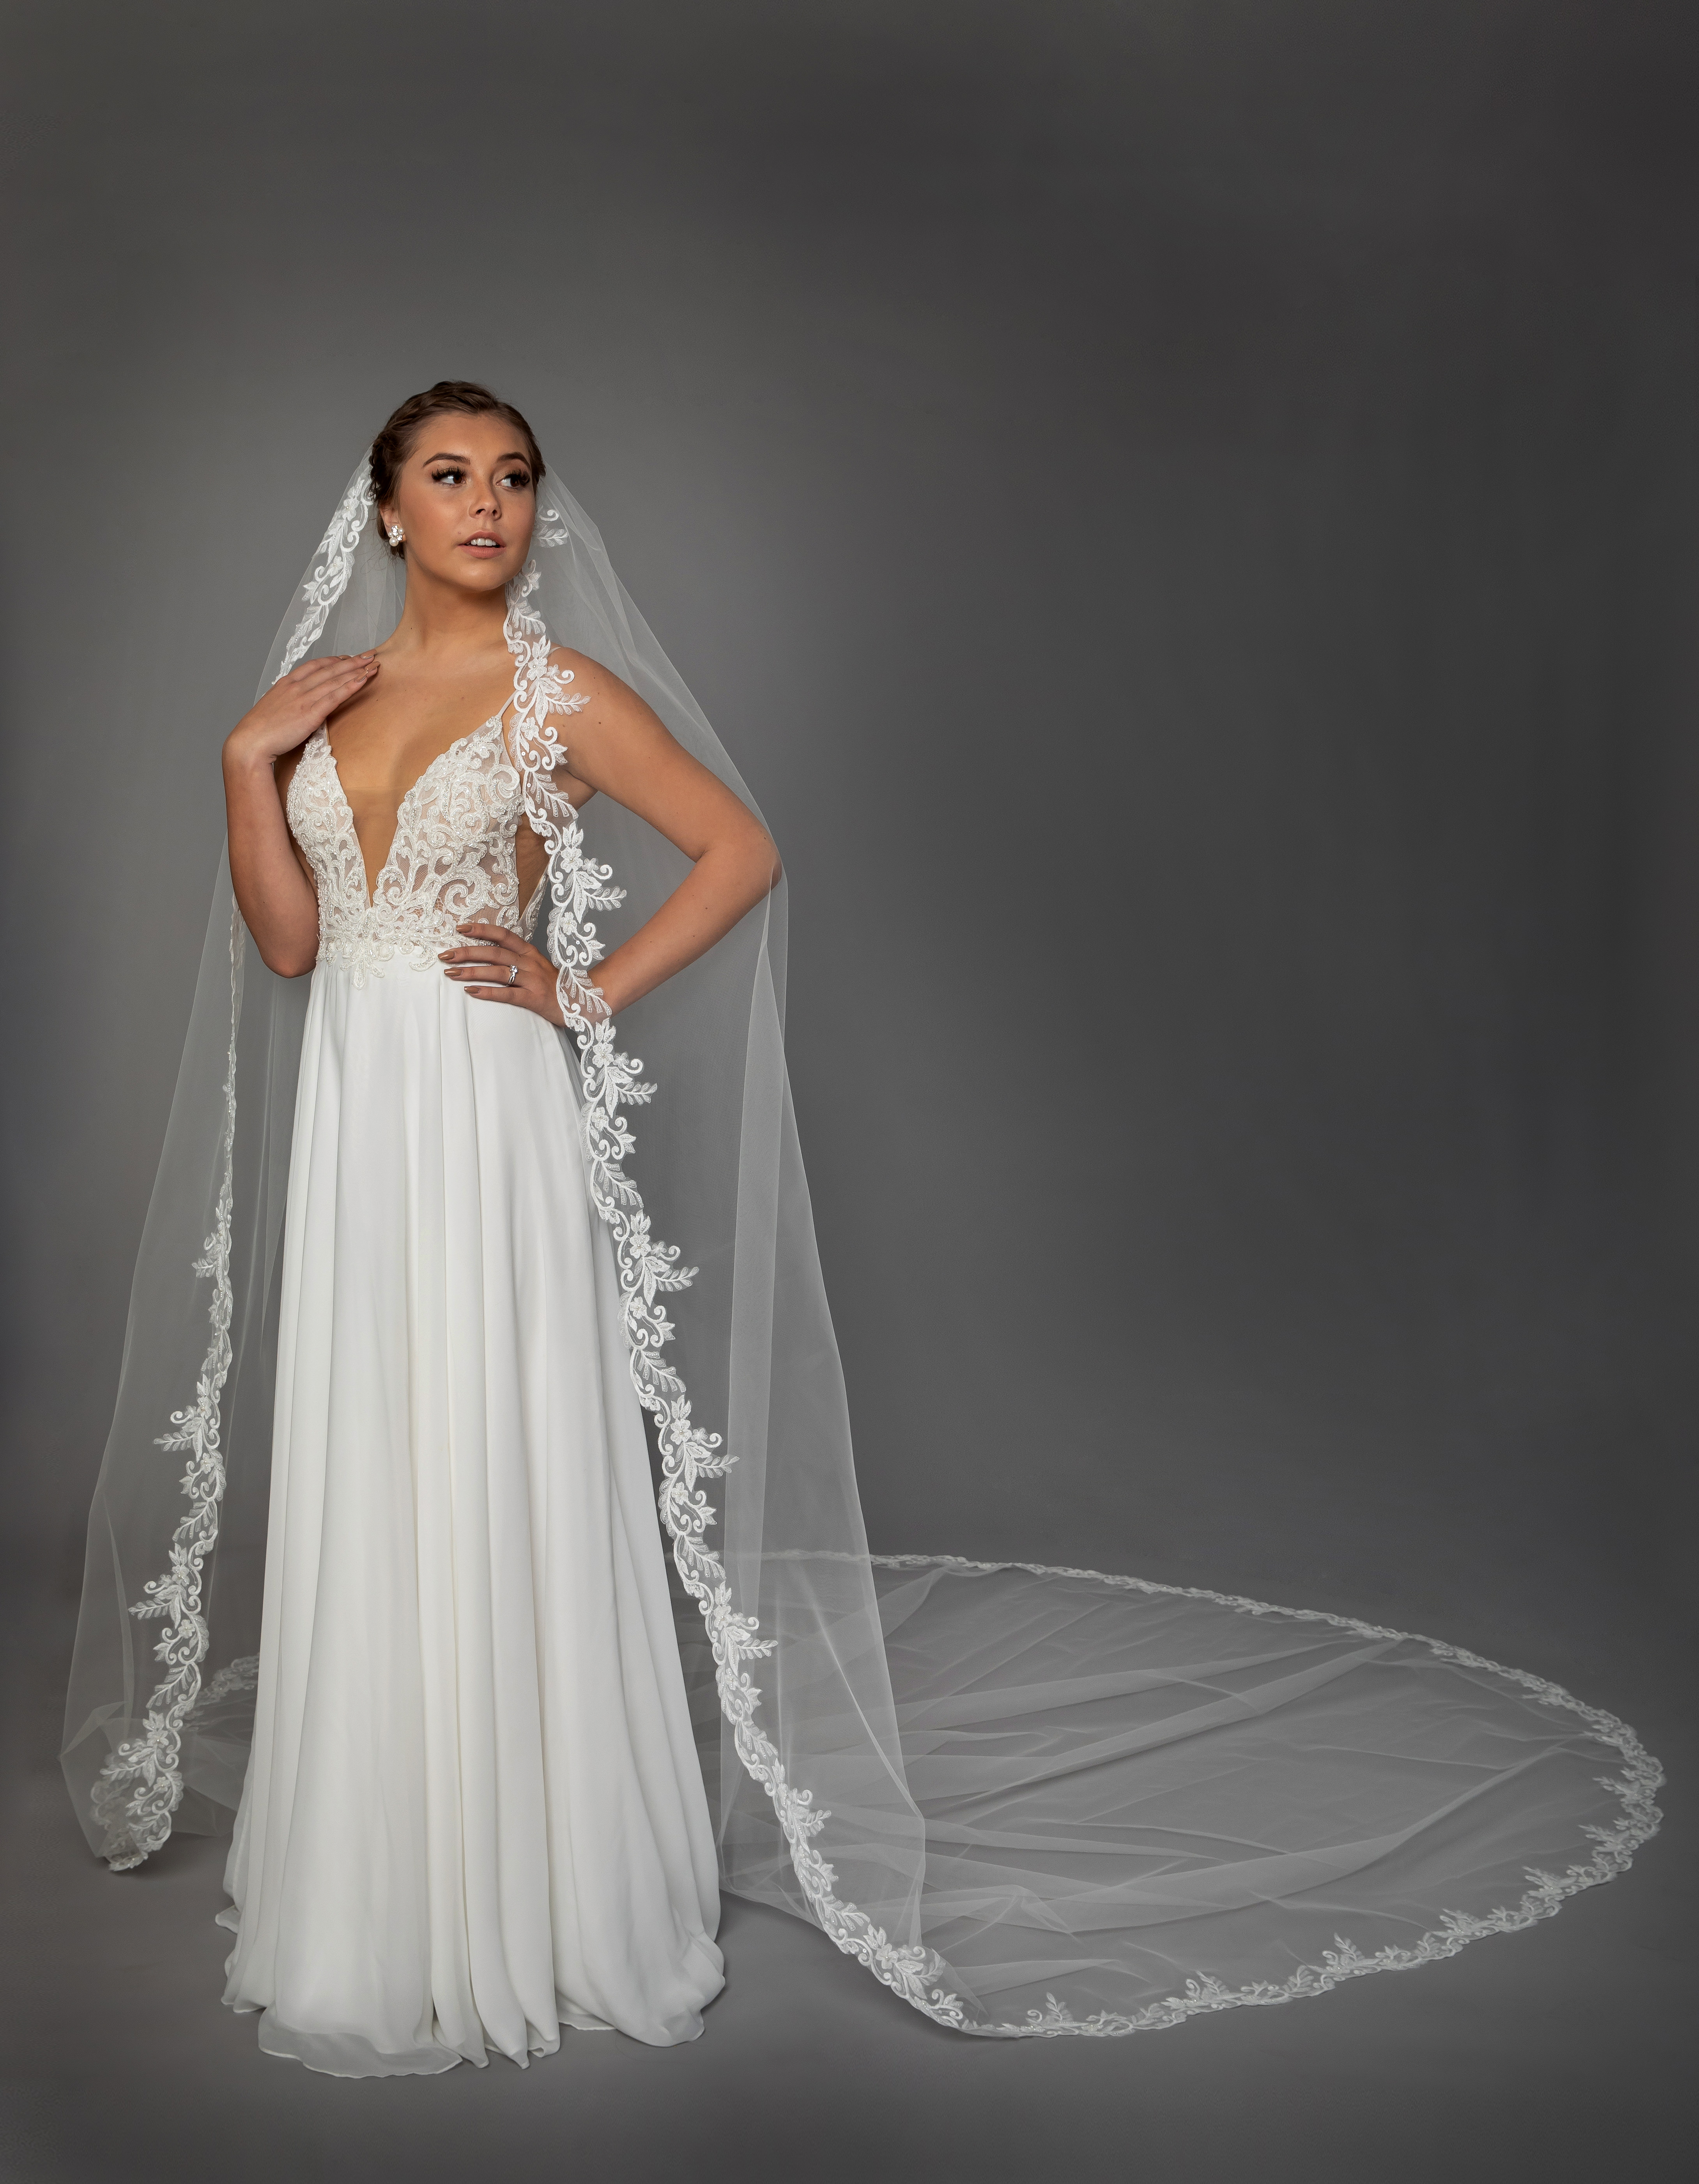 Bridal Classics Marquise Veil Collection MV-2485